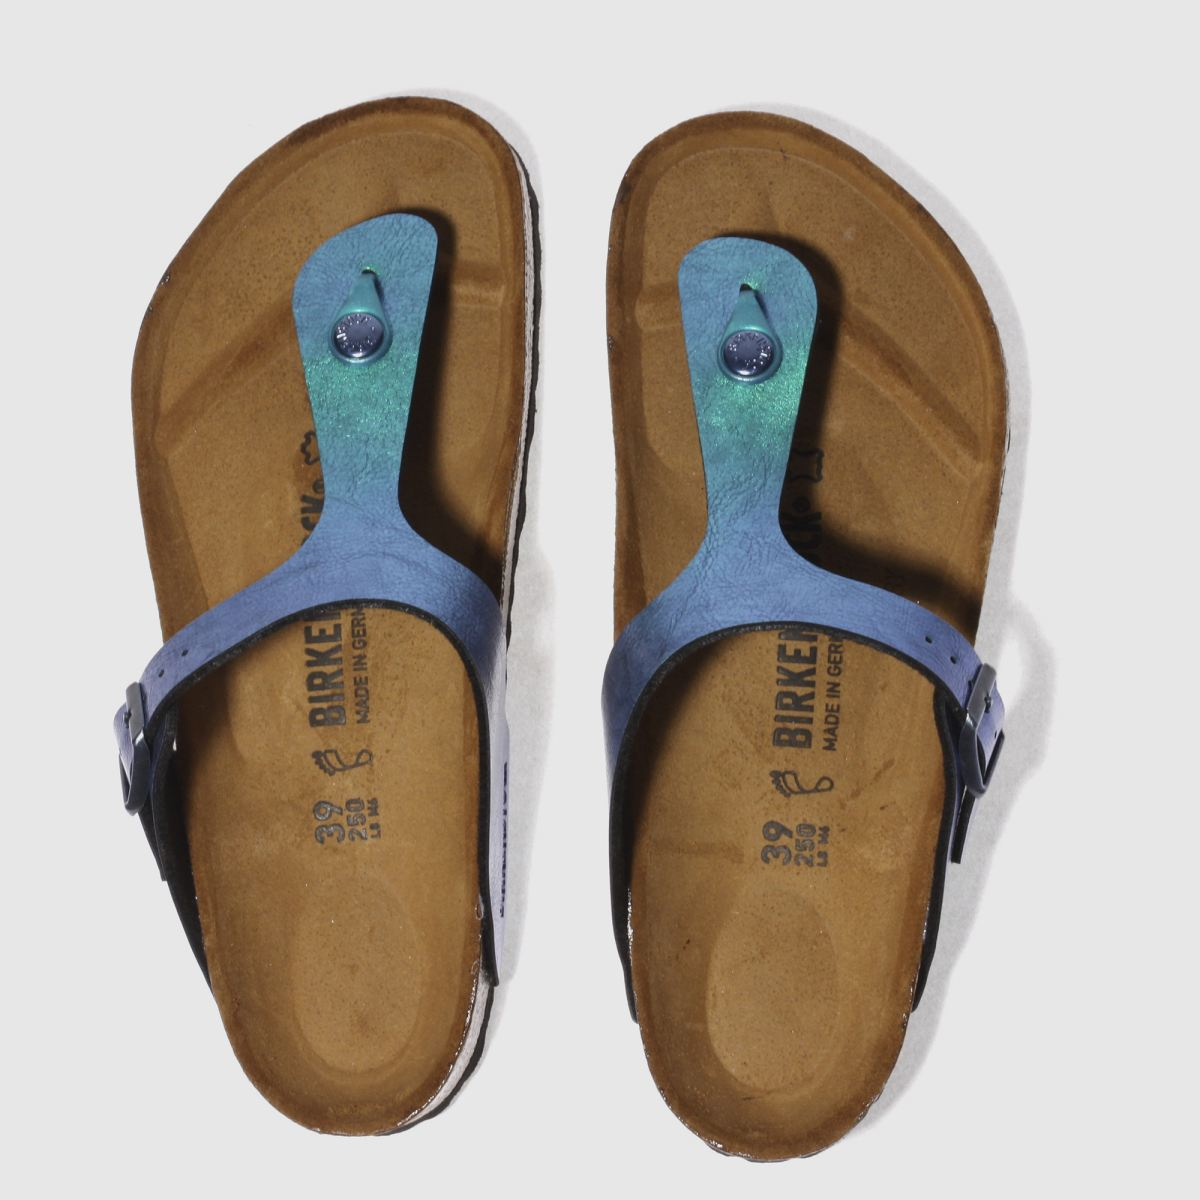 Birkenstock Blue Gizeh Graceful Gemm Sandals